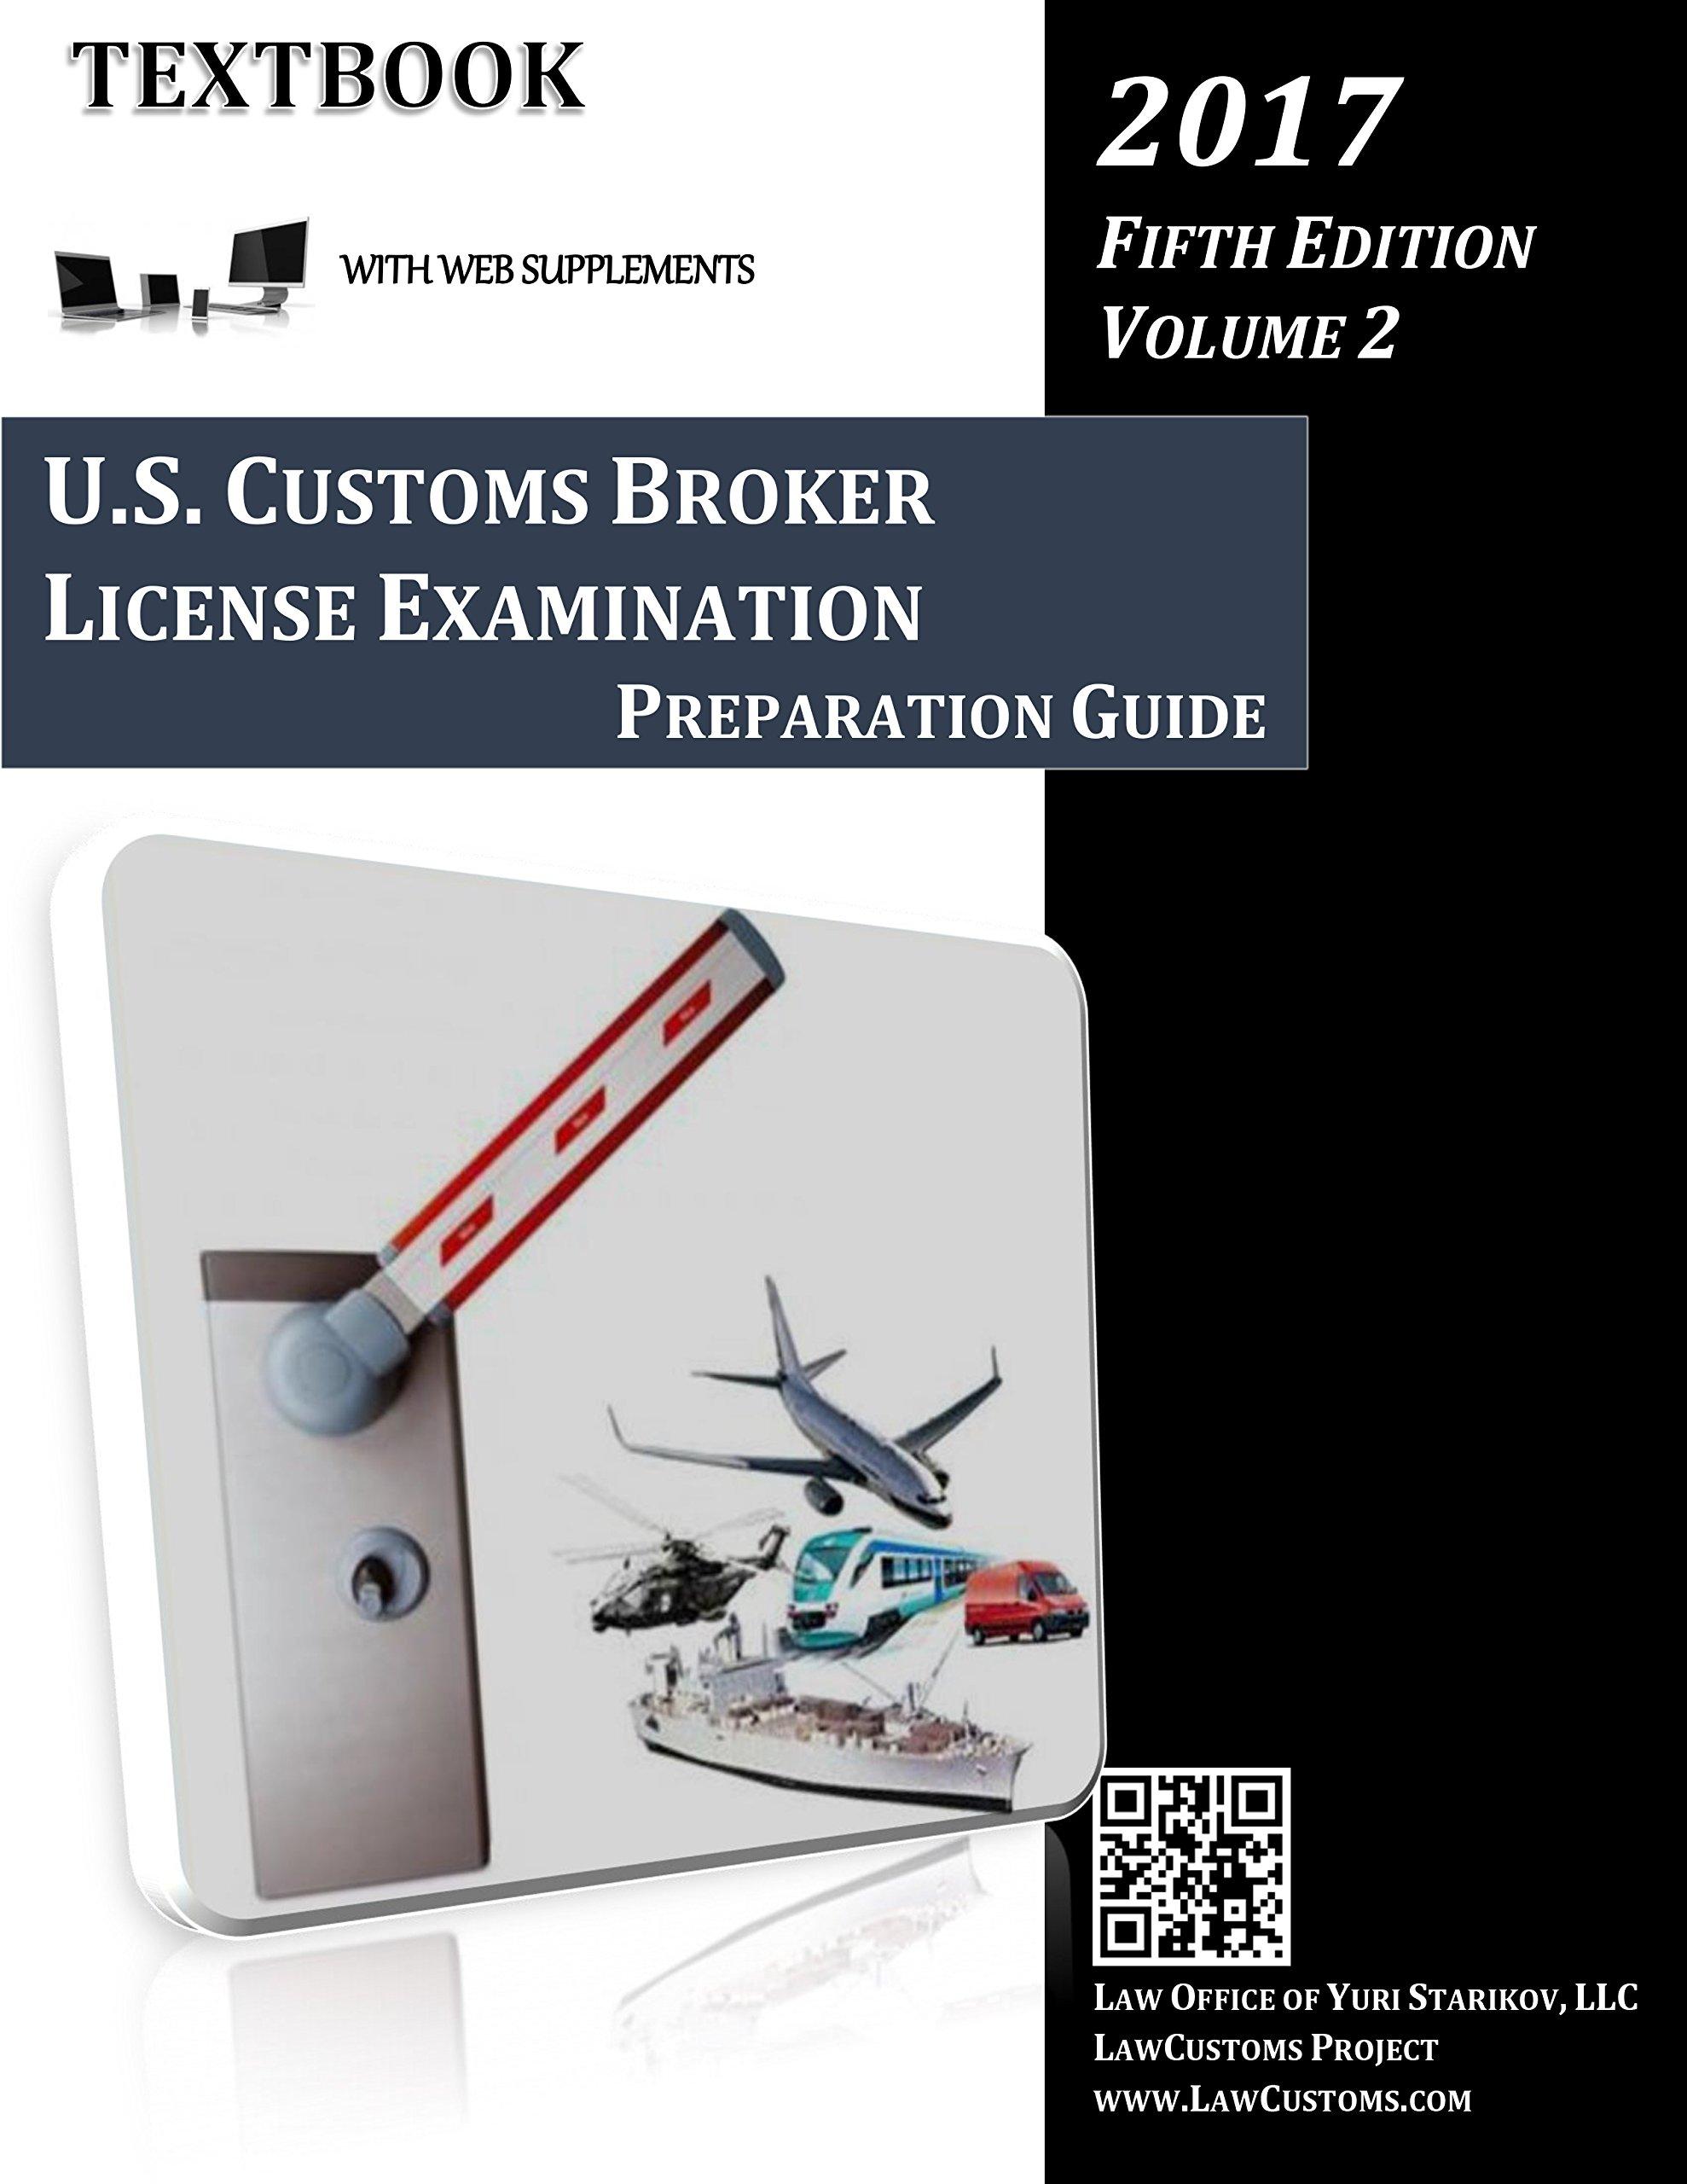 Read Online U.S. Customs Broker License Examination Preparation Guide Textbook (5th Ed. Vol. 2, 2017) ePub fb2 ebook